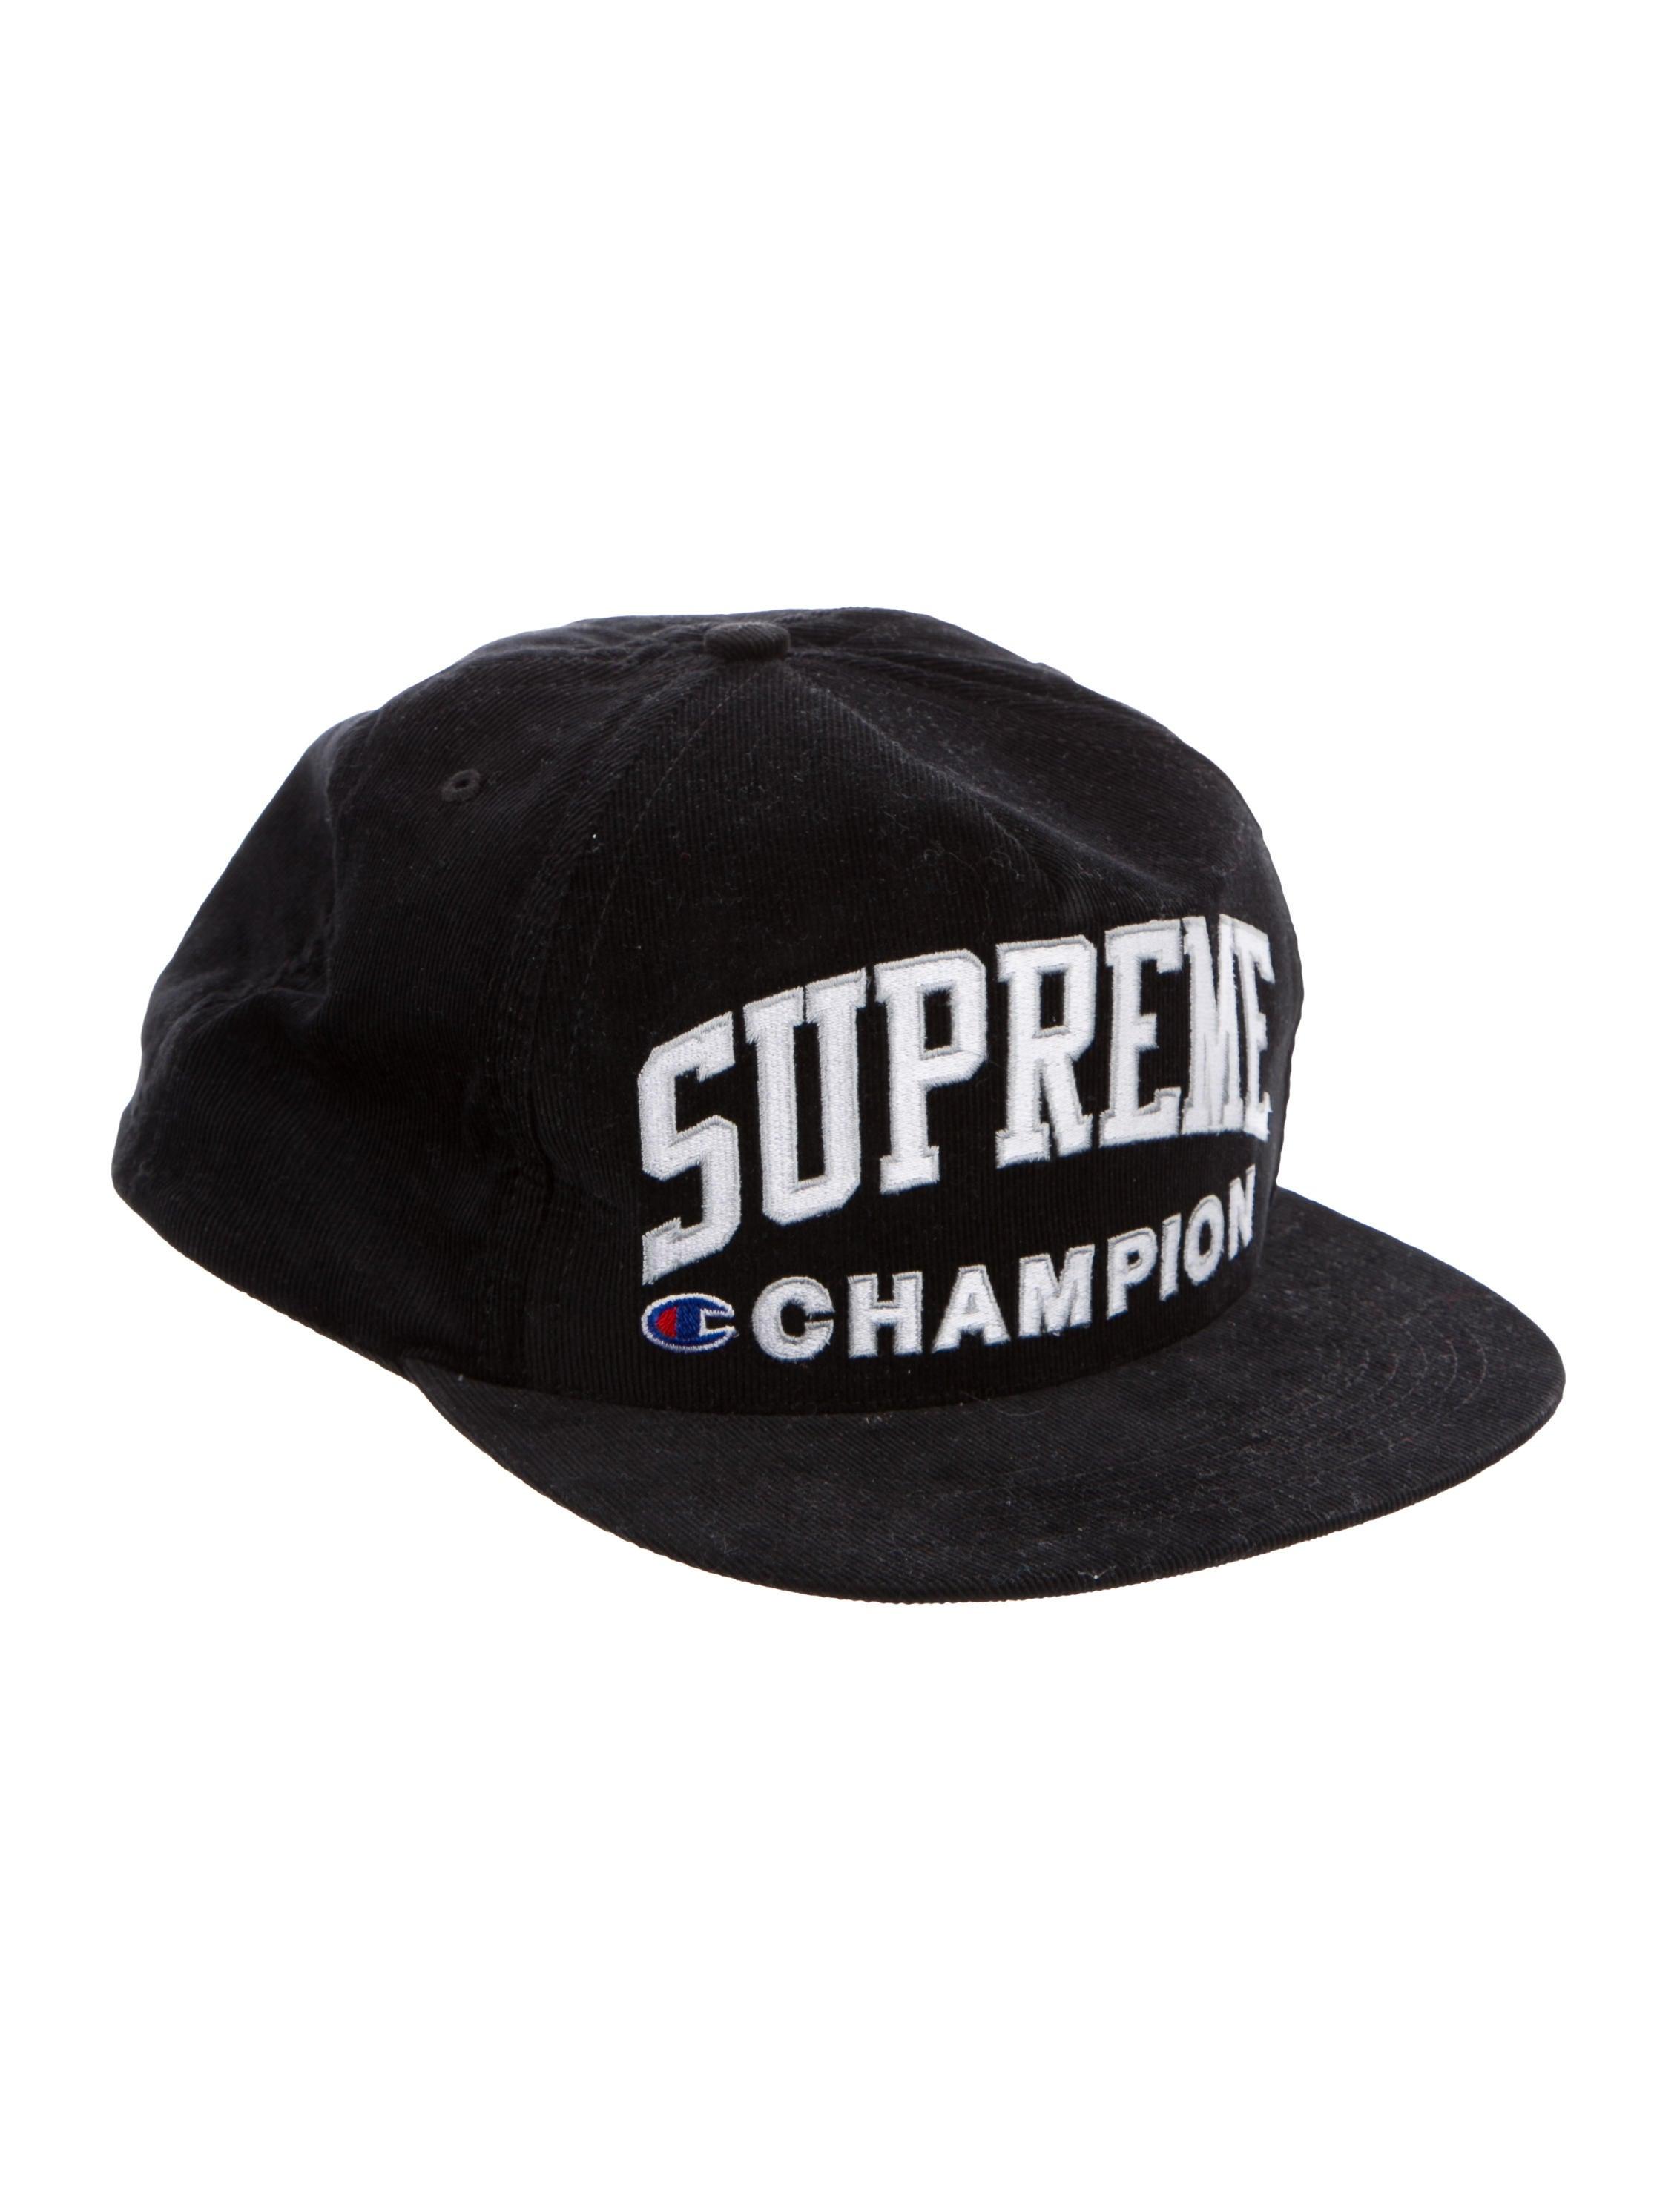 944549bd72f Supreme x Champion Logo Corduroy Hat - Accessories - WSUPC20030 ...